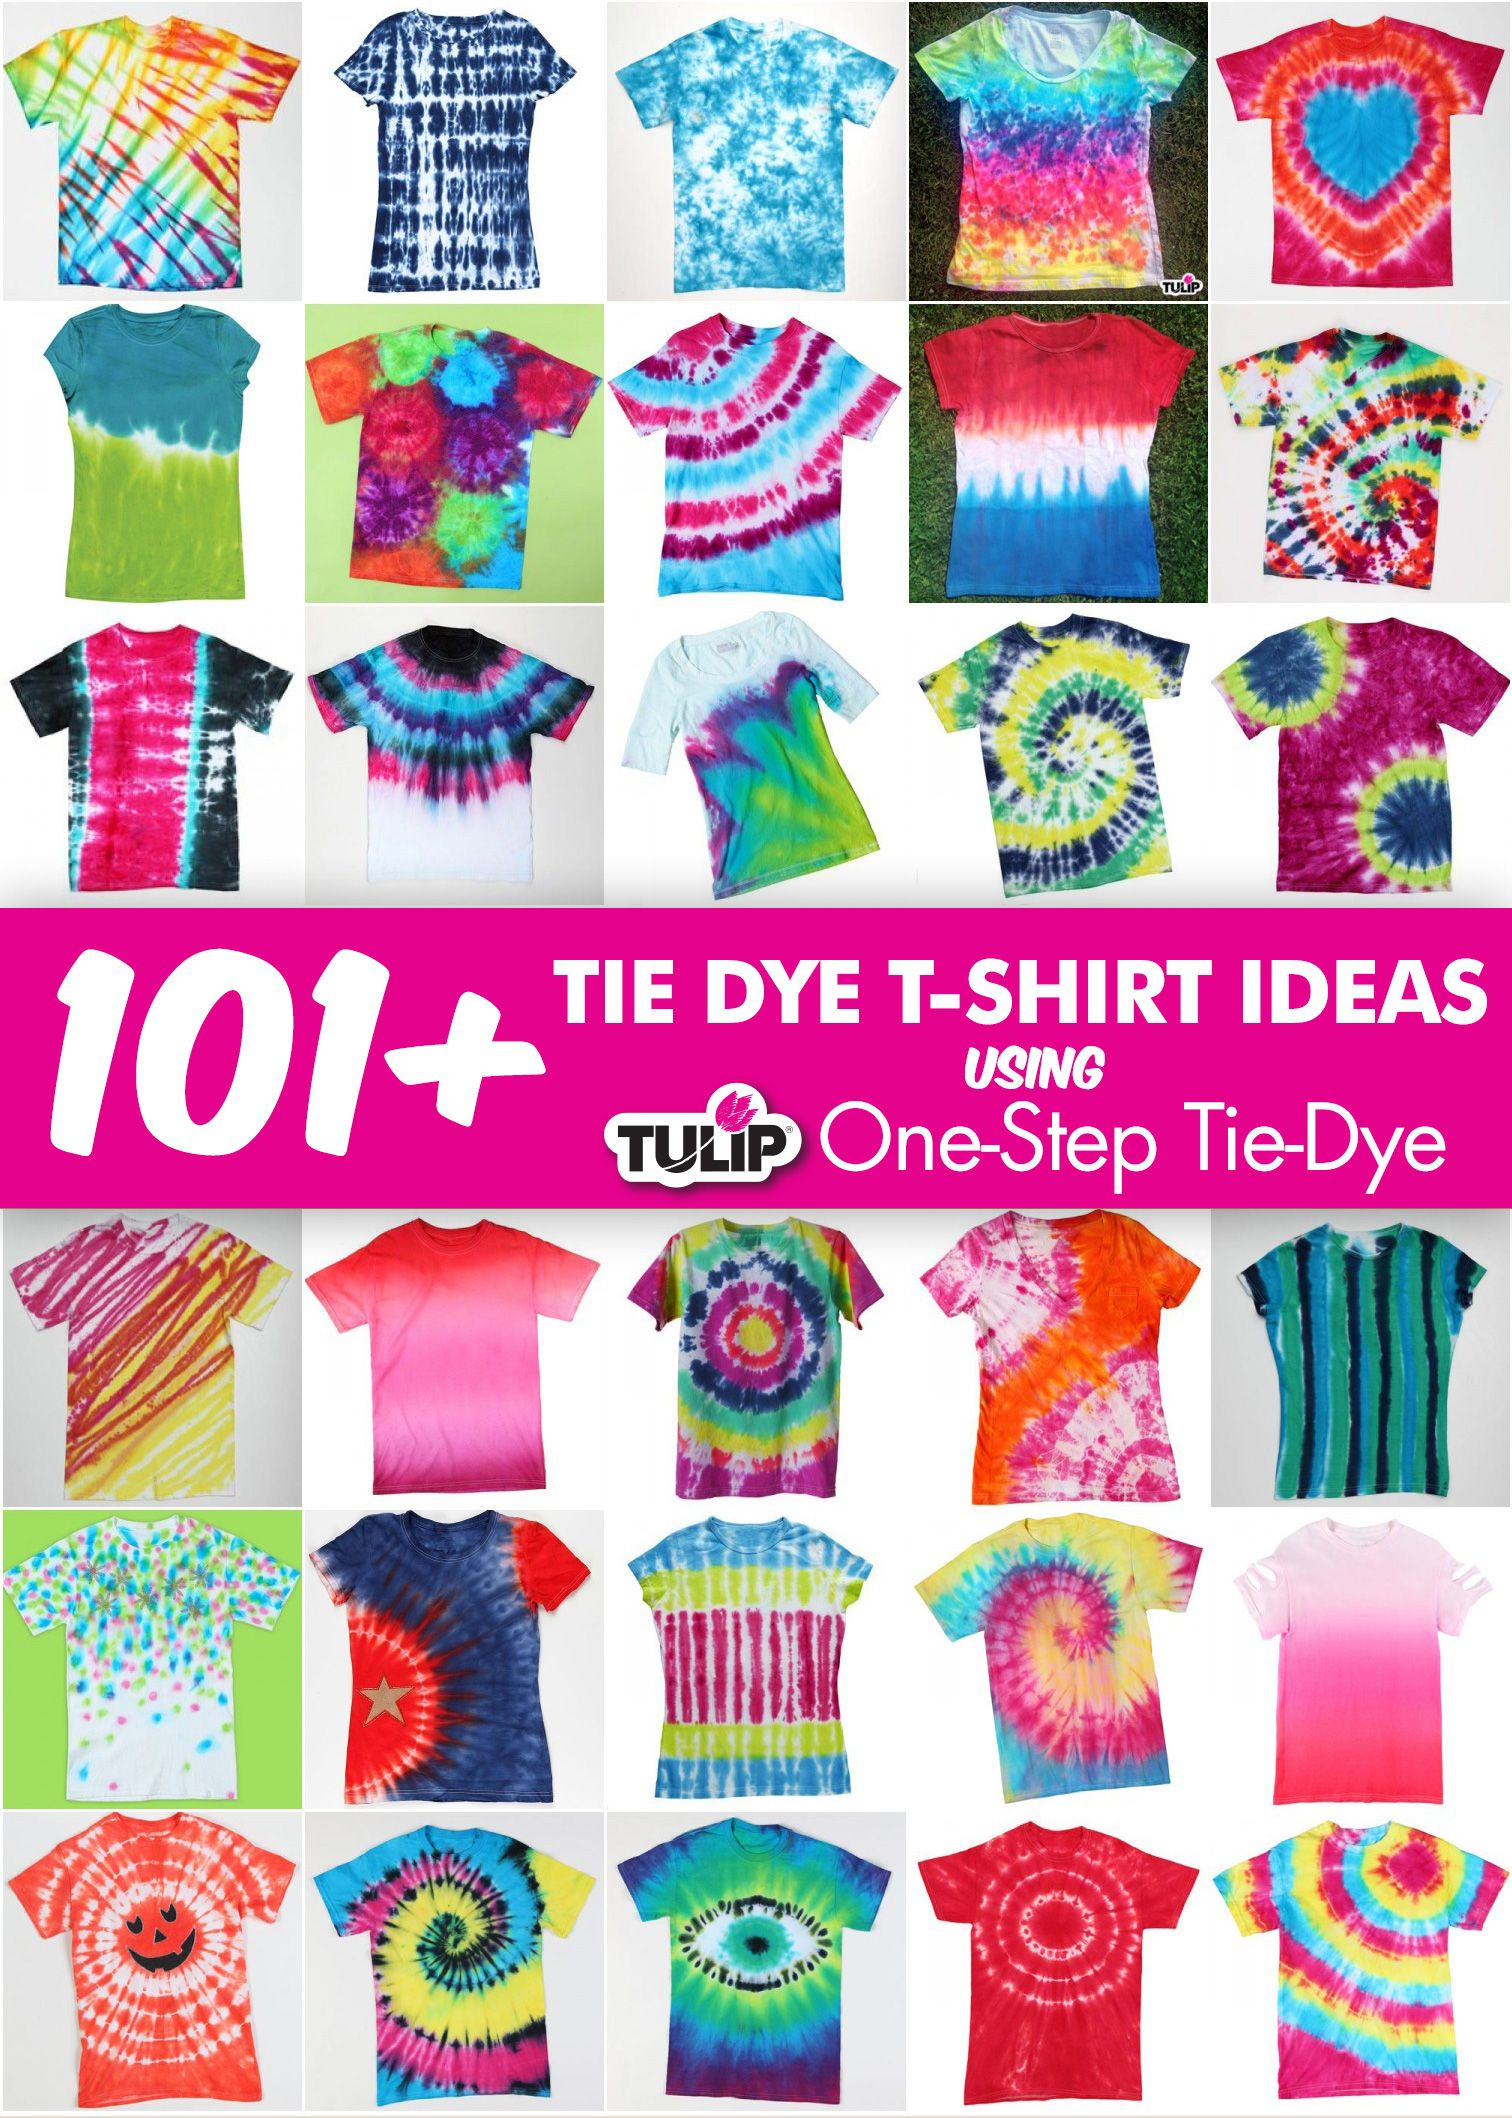 101 Tie Dye T Shirt Shirt Ideas At Occasionprints Kids